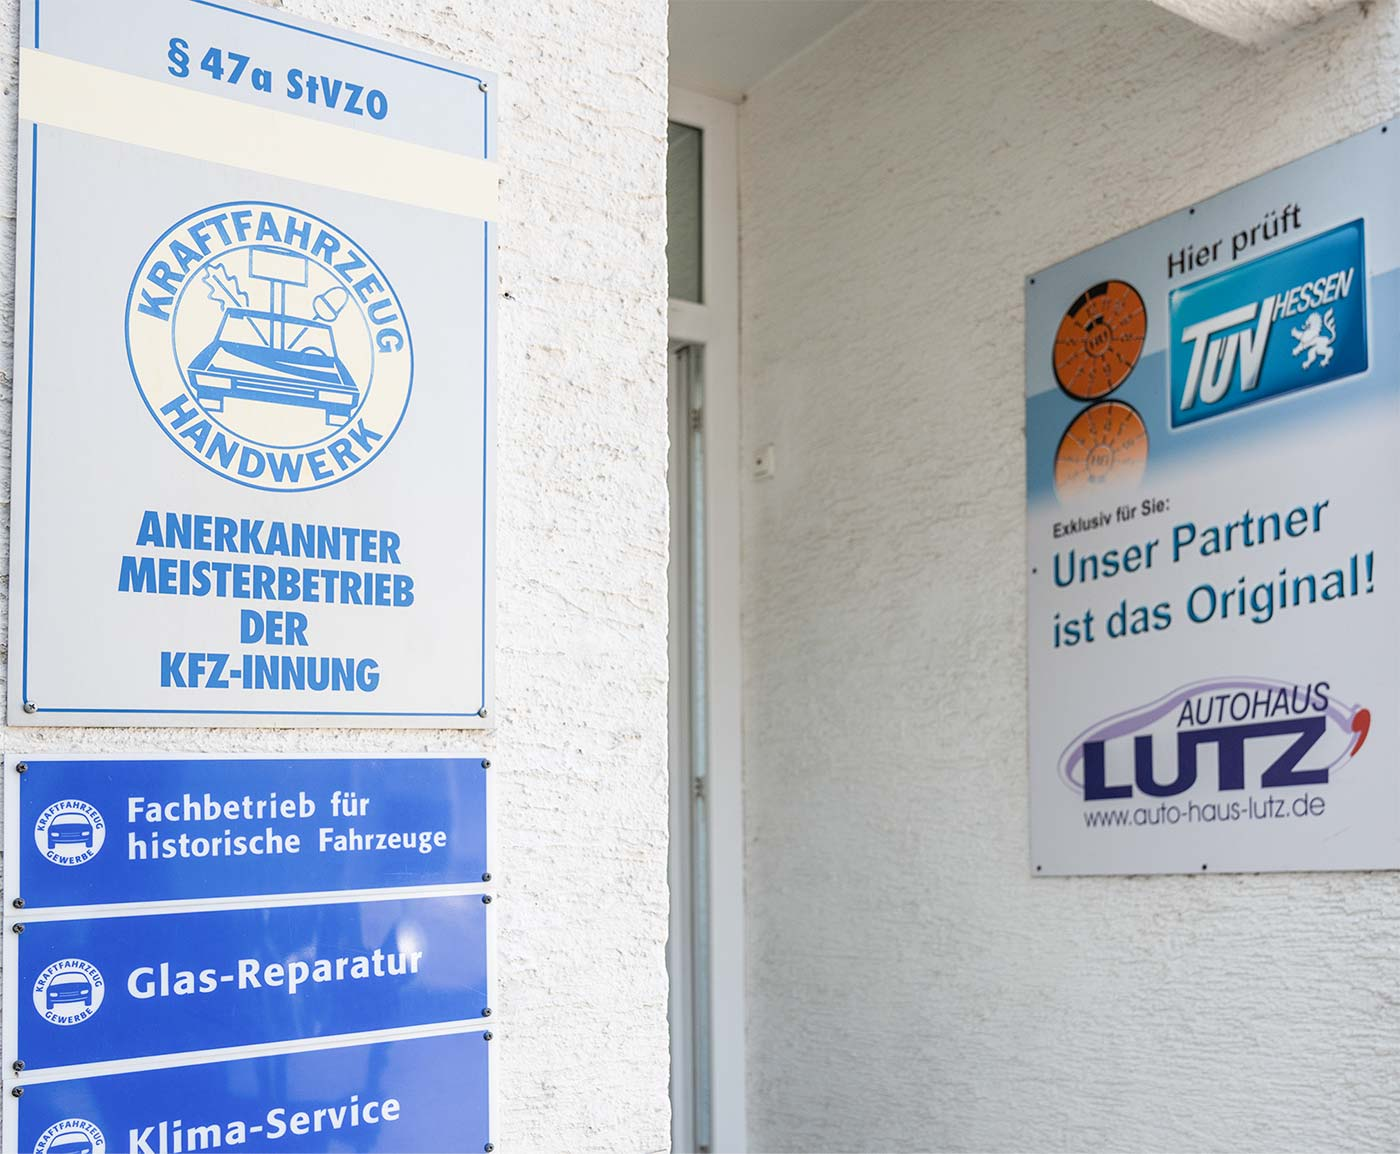 Kfz Meisterbetrieb TUEV-Hessen Partner